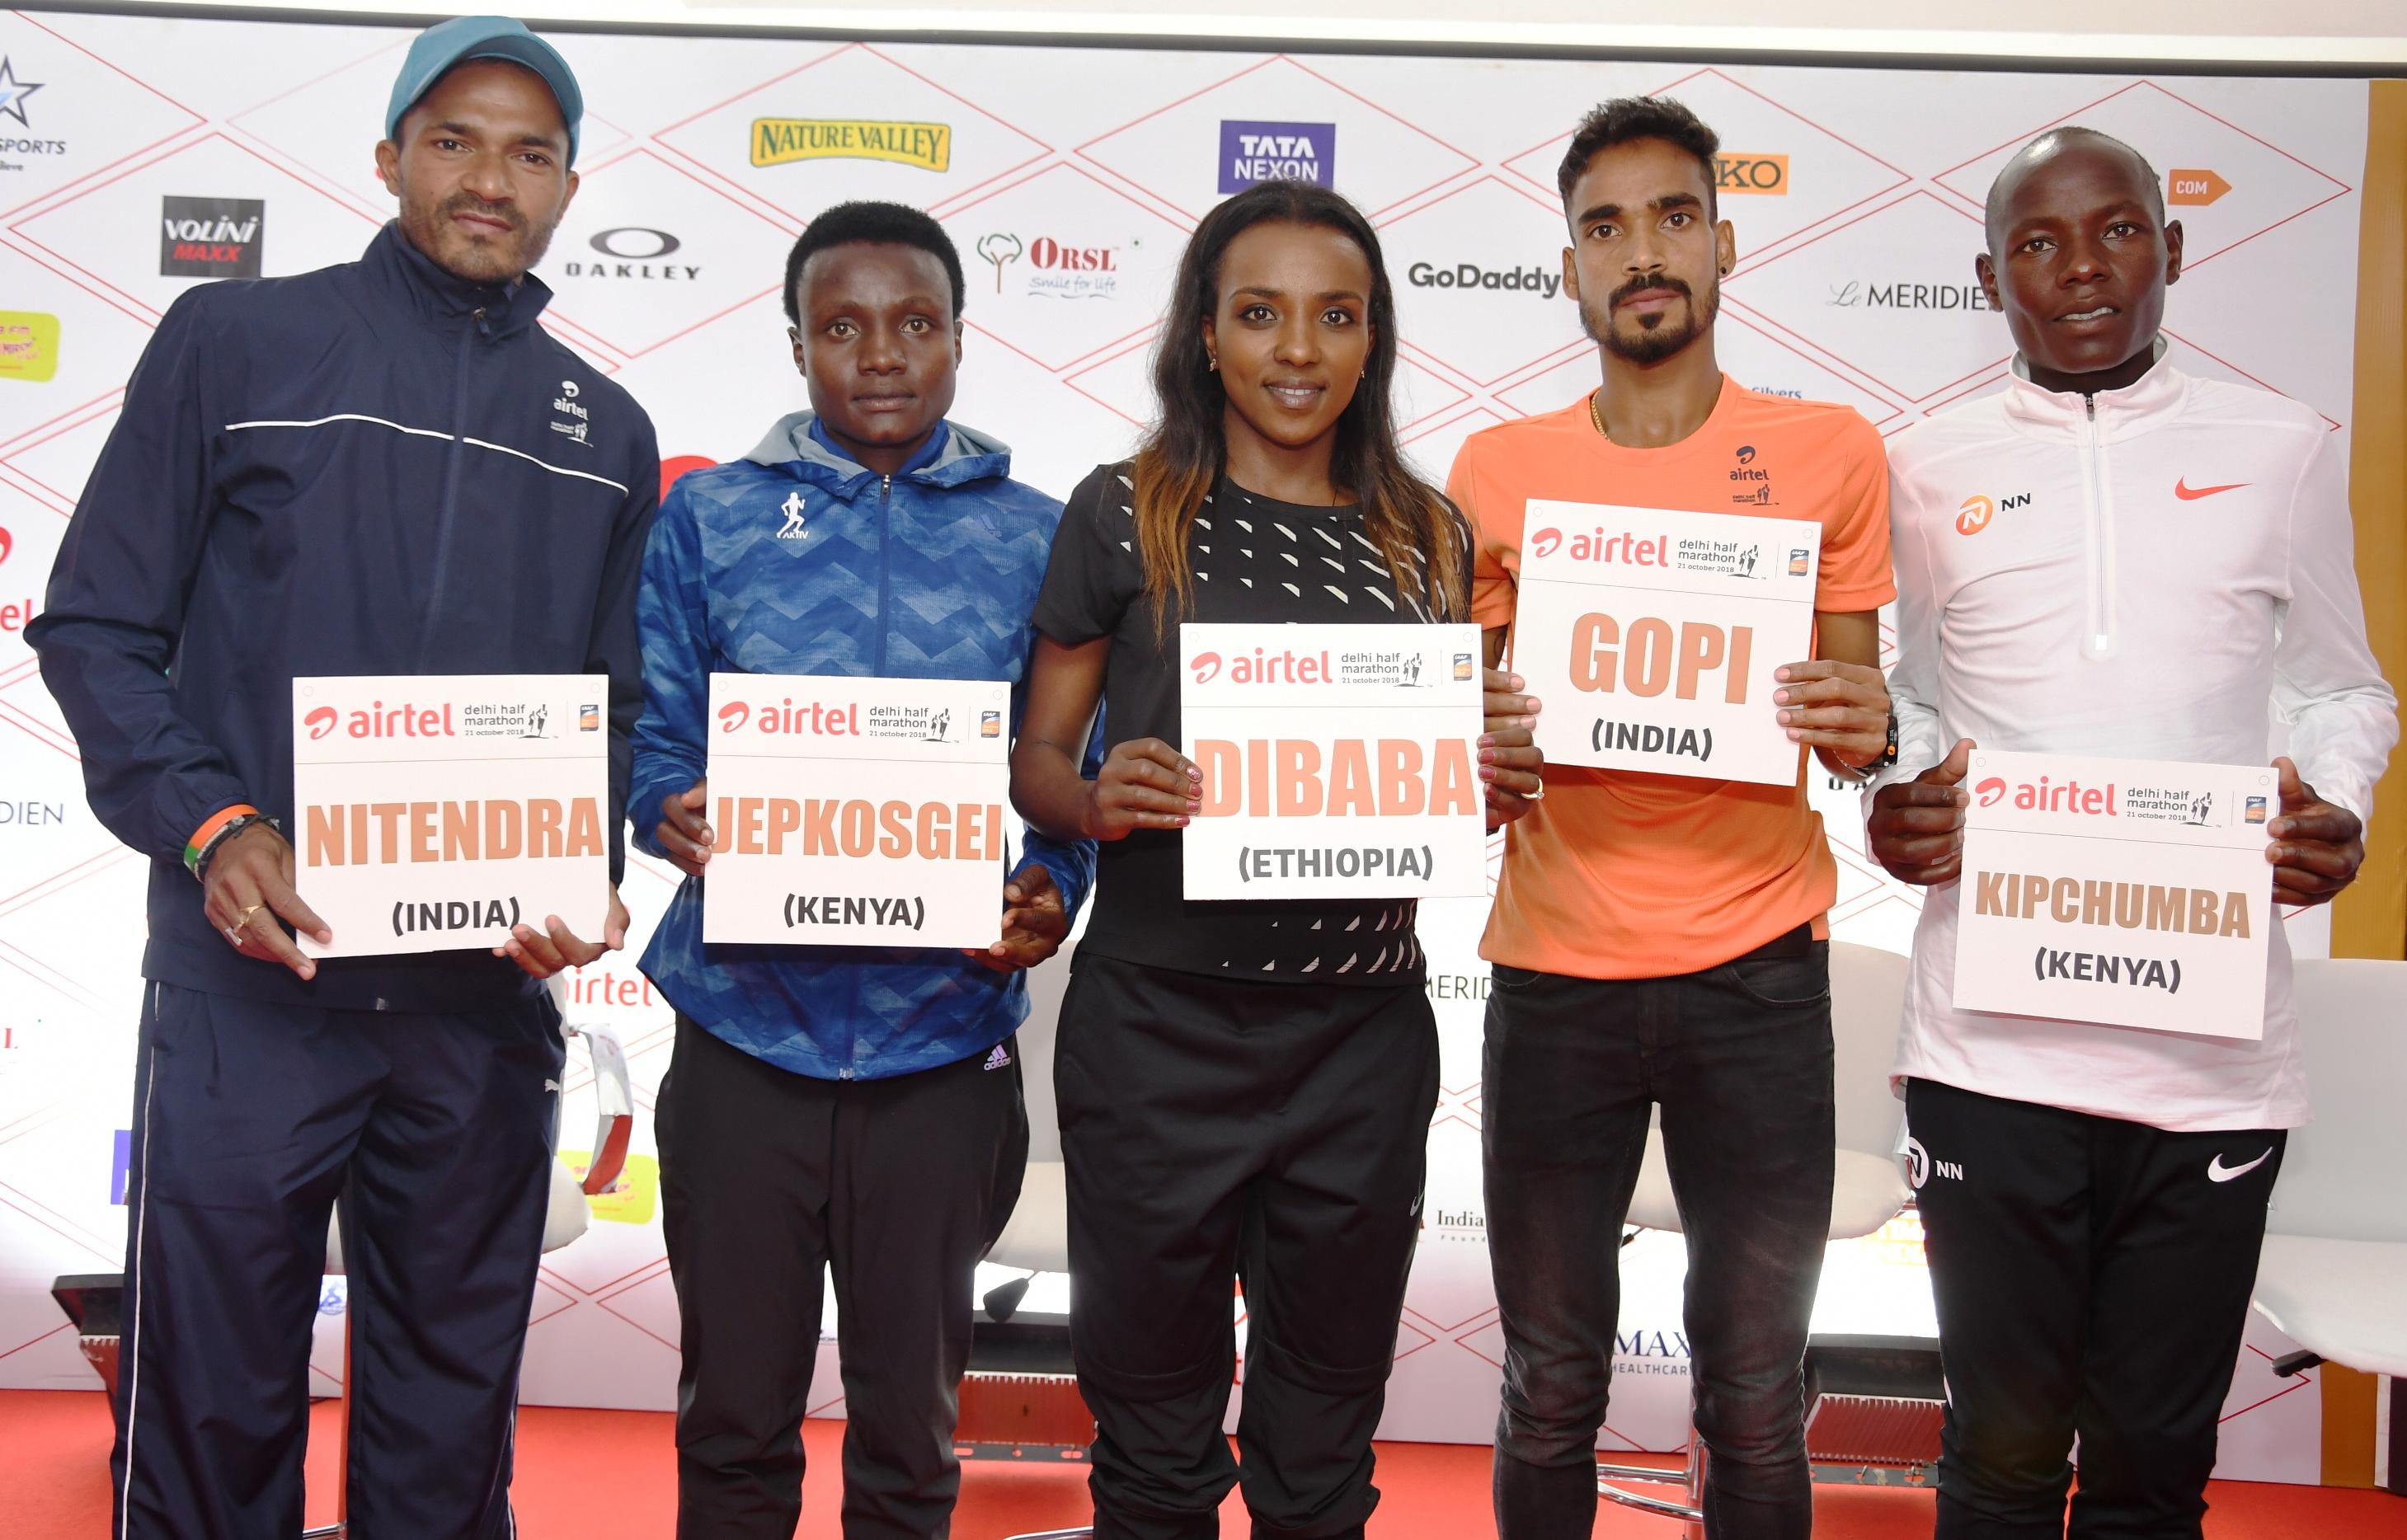 5 Weeks after running 2:18 in Berlin, Tirunesh Dibaba says